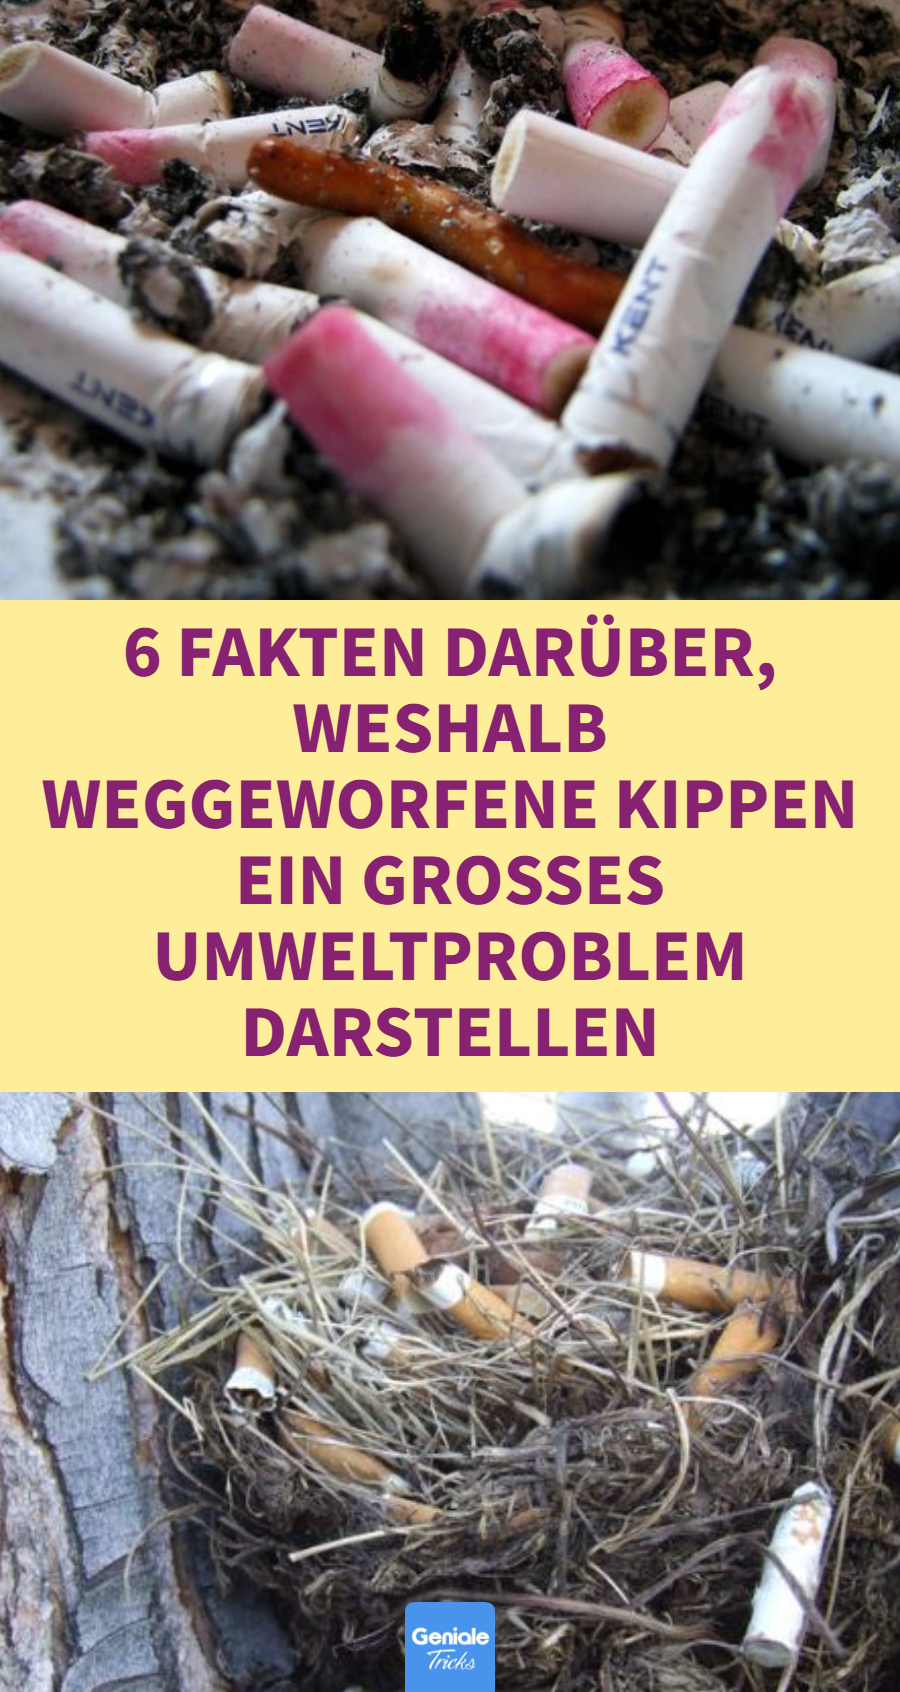 Umweltproblem weggeworfene Zigarettenkippen: 6 Fakten